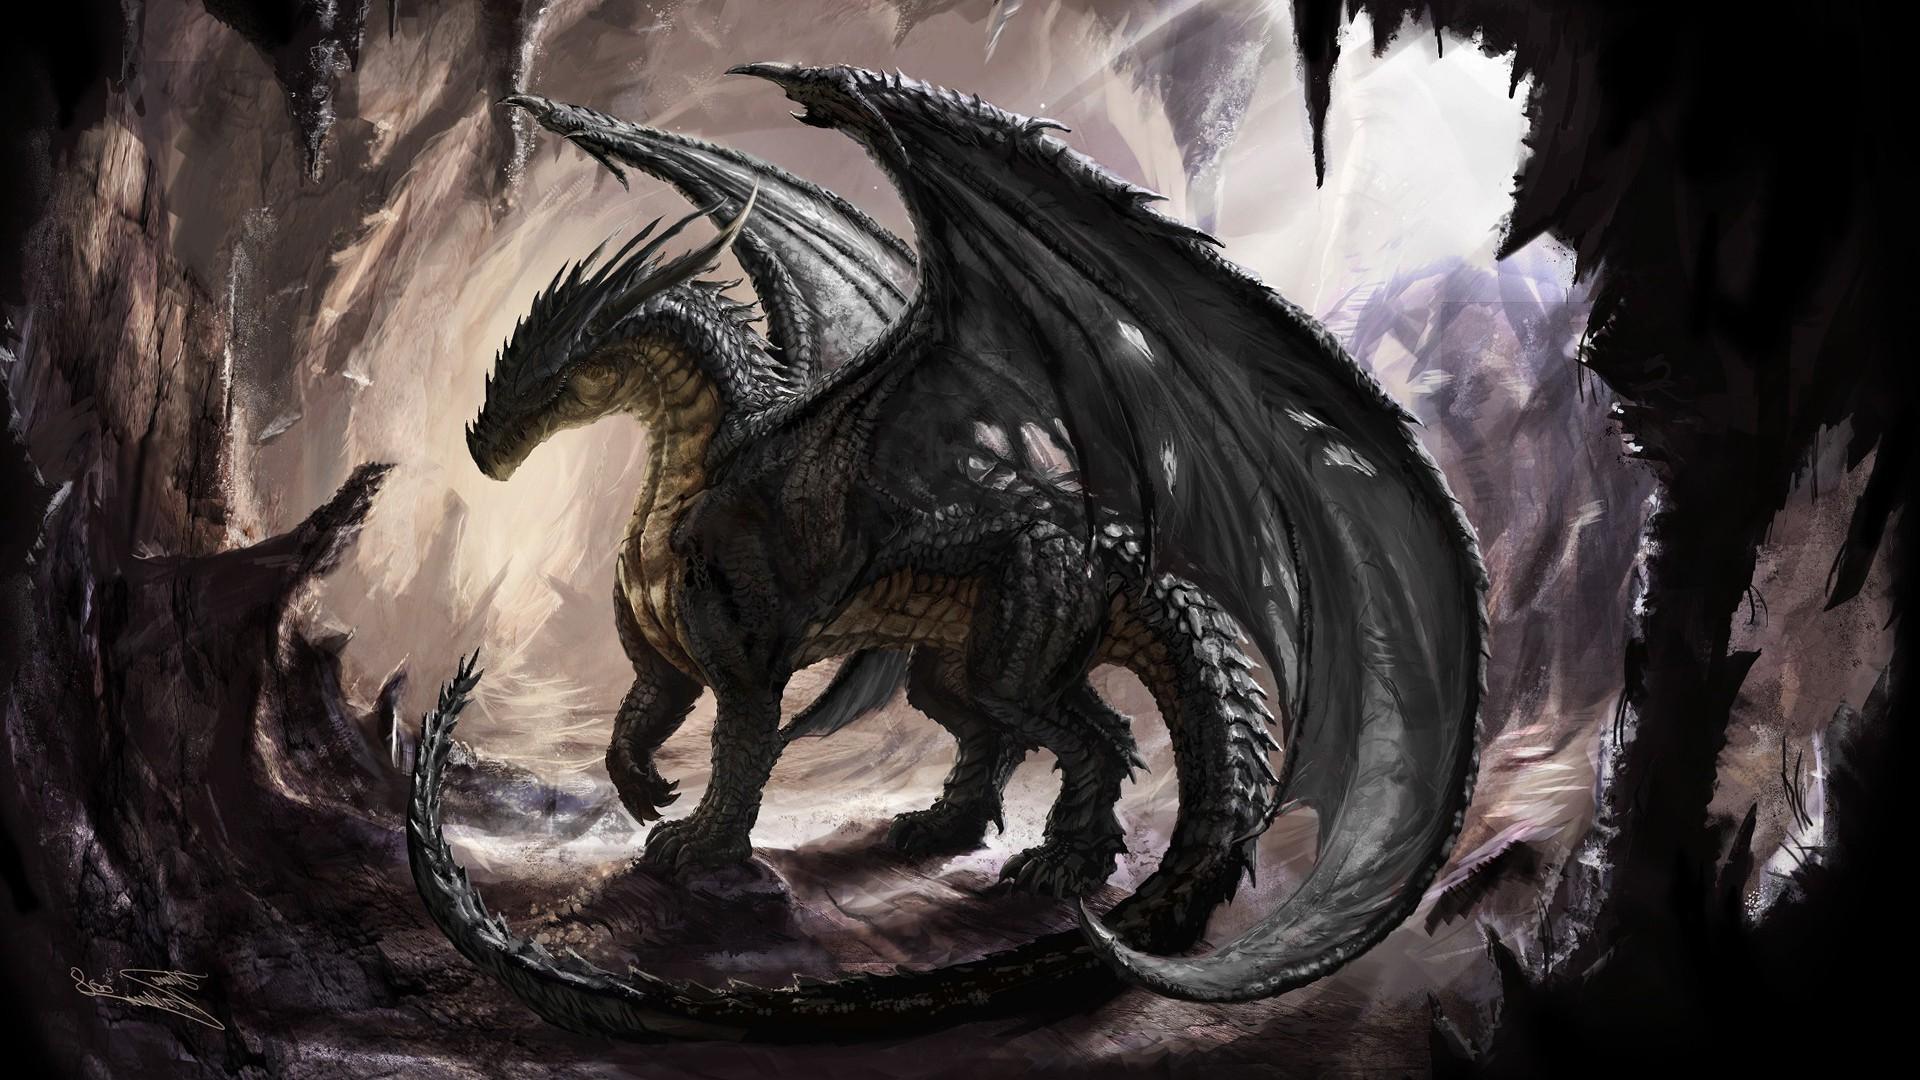 Anime Dragon Wallpaper 67 Images